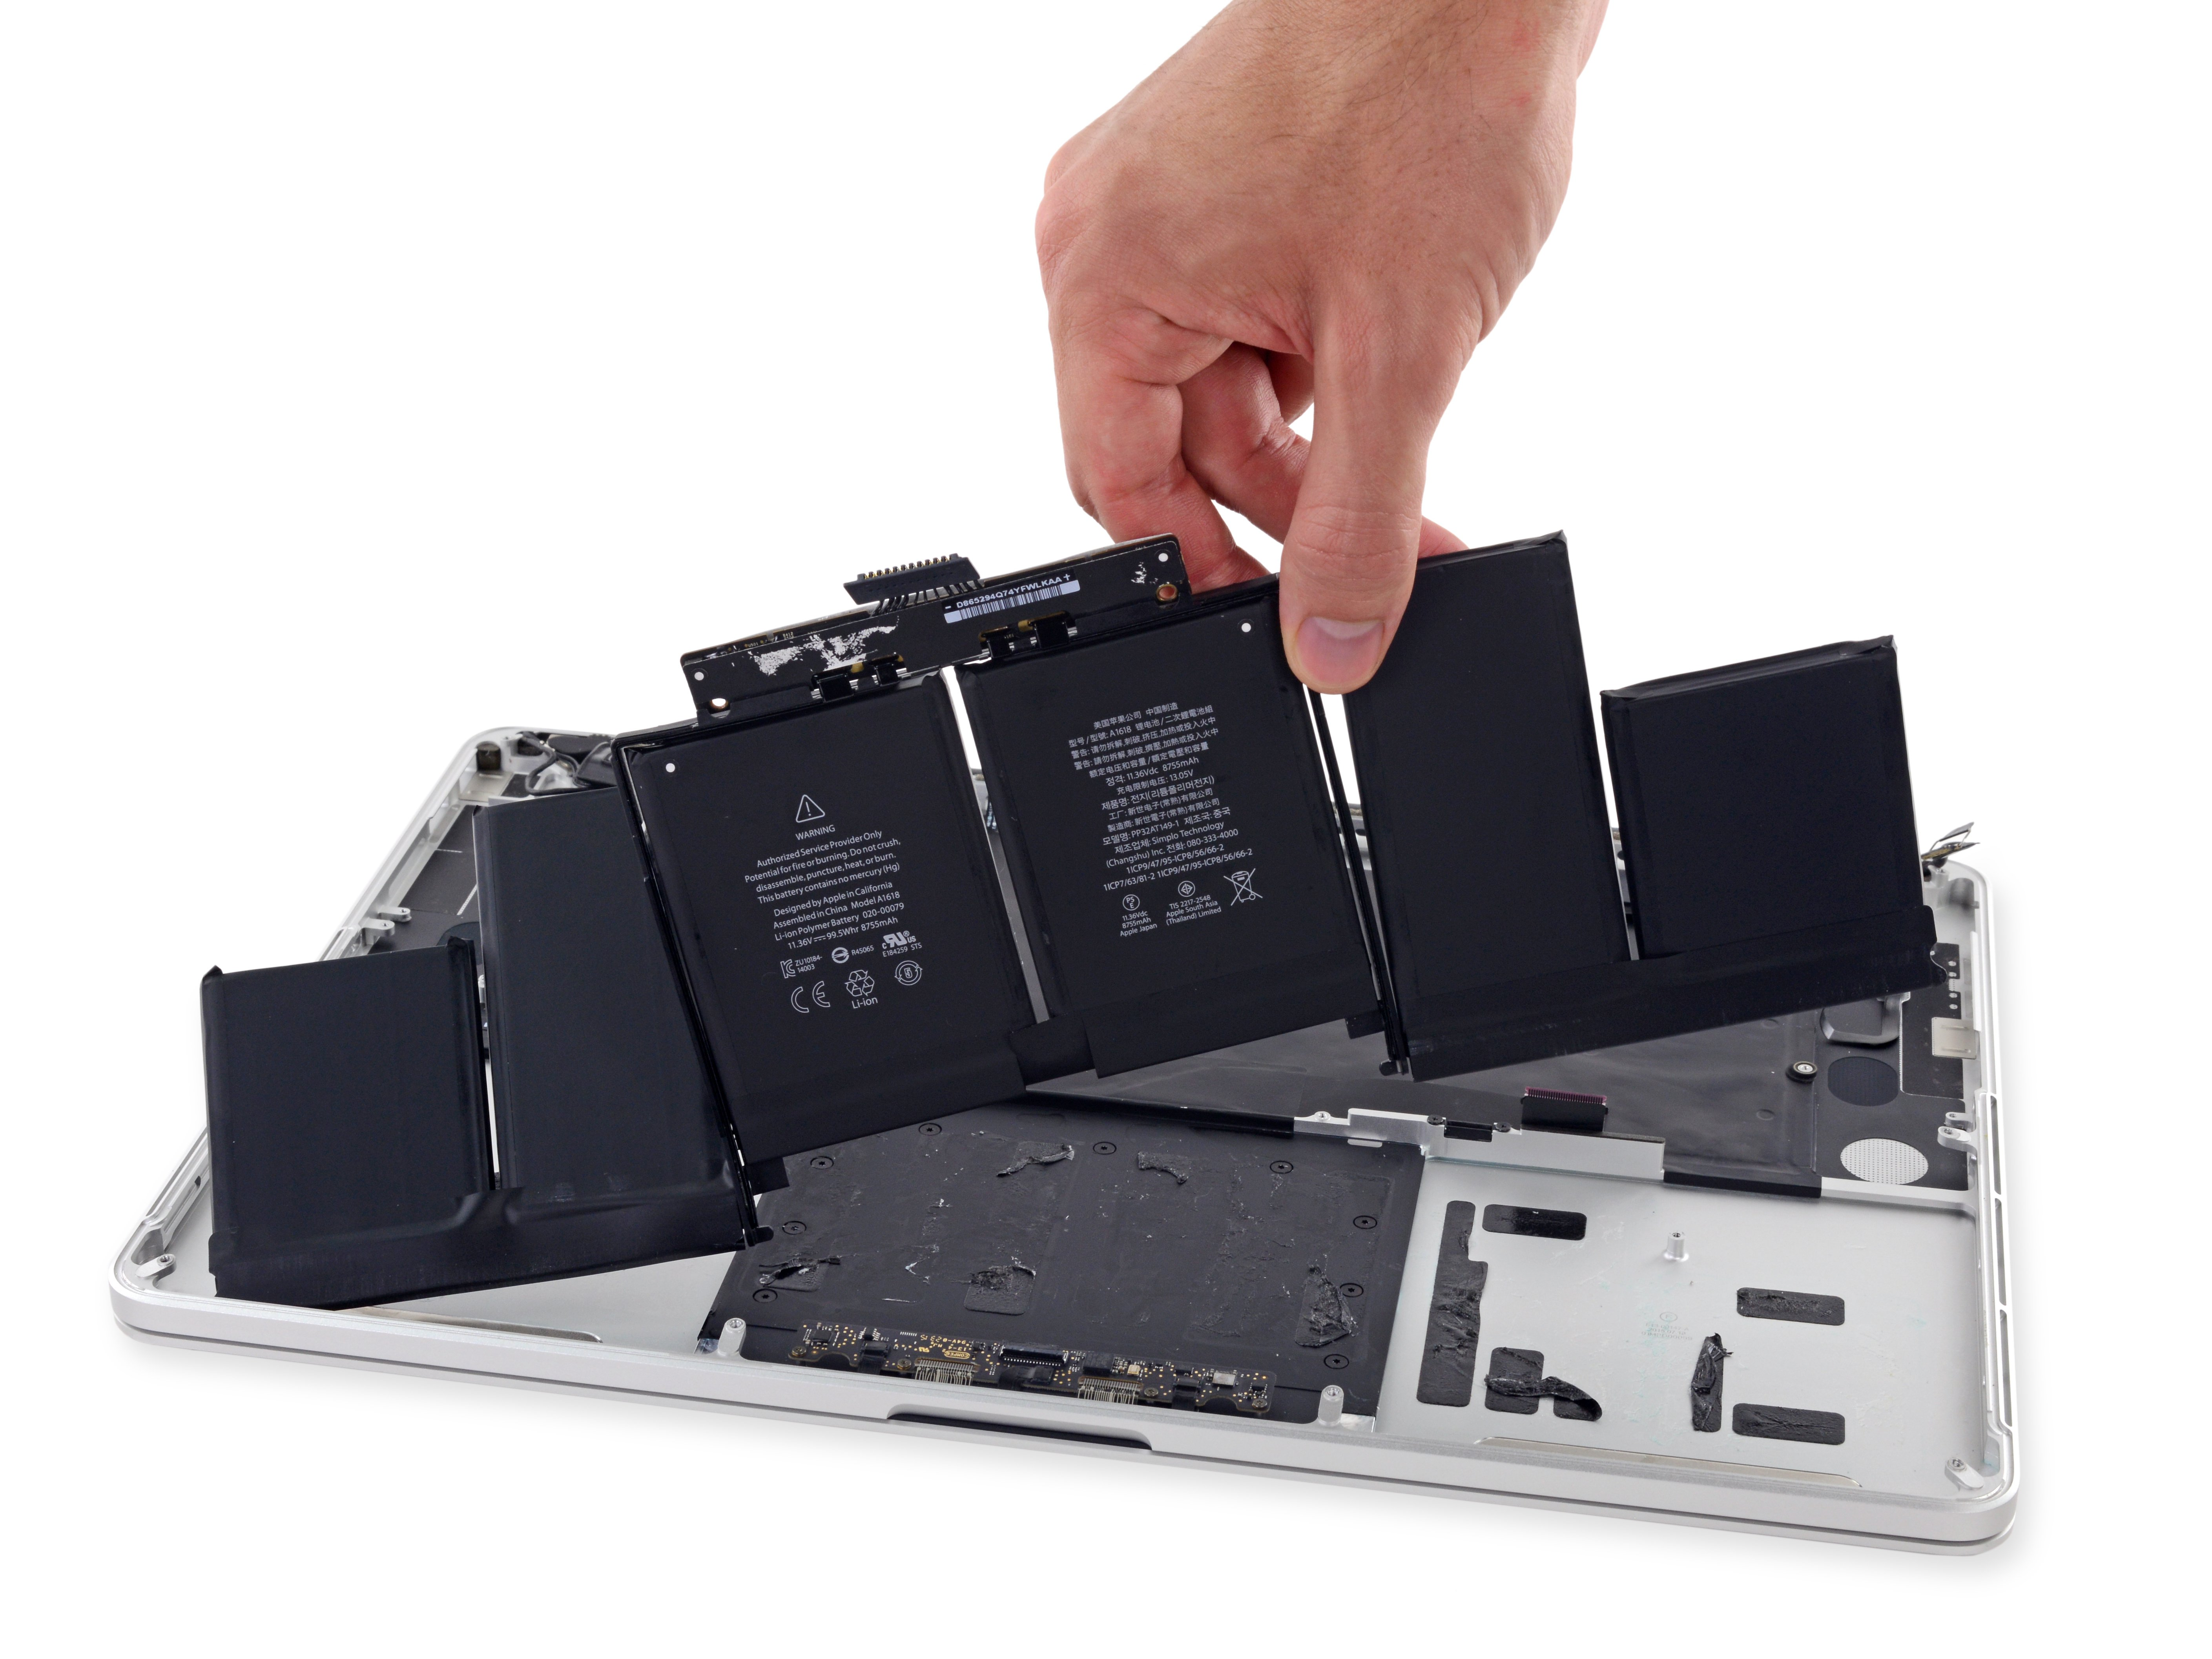 MacBook akkumulátor csere 29.990. Ft tól iCentrum Apple